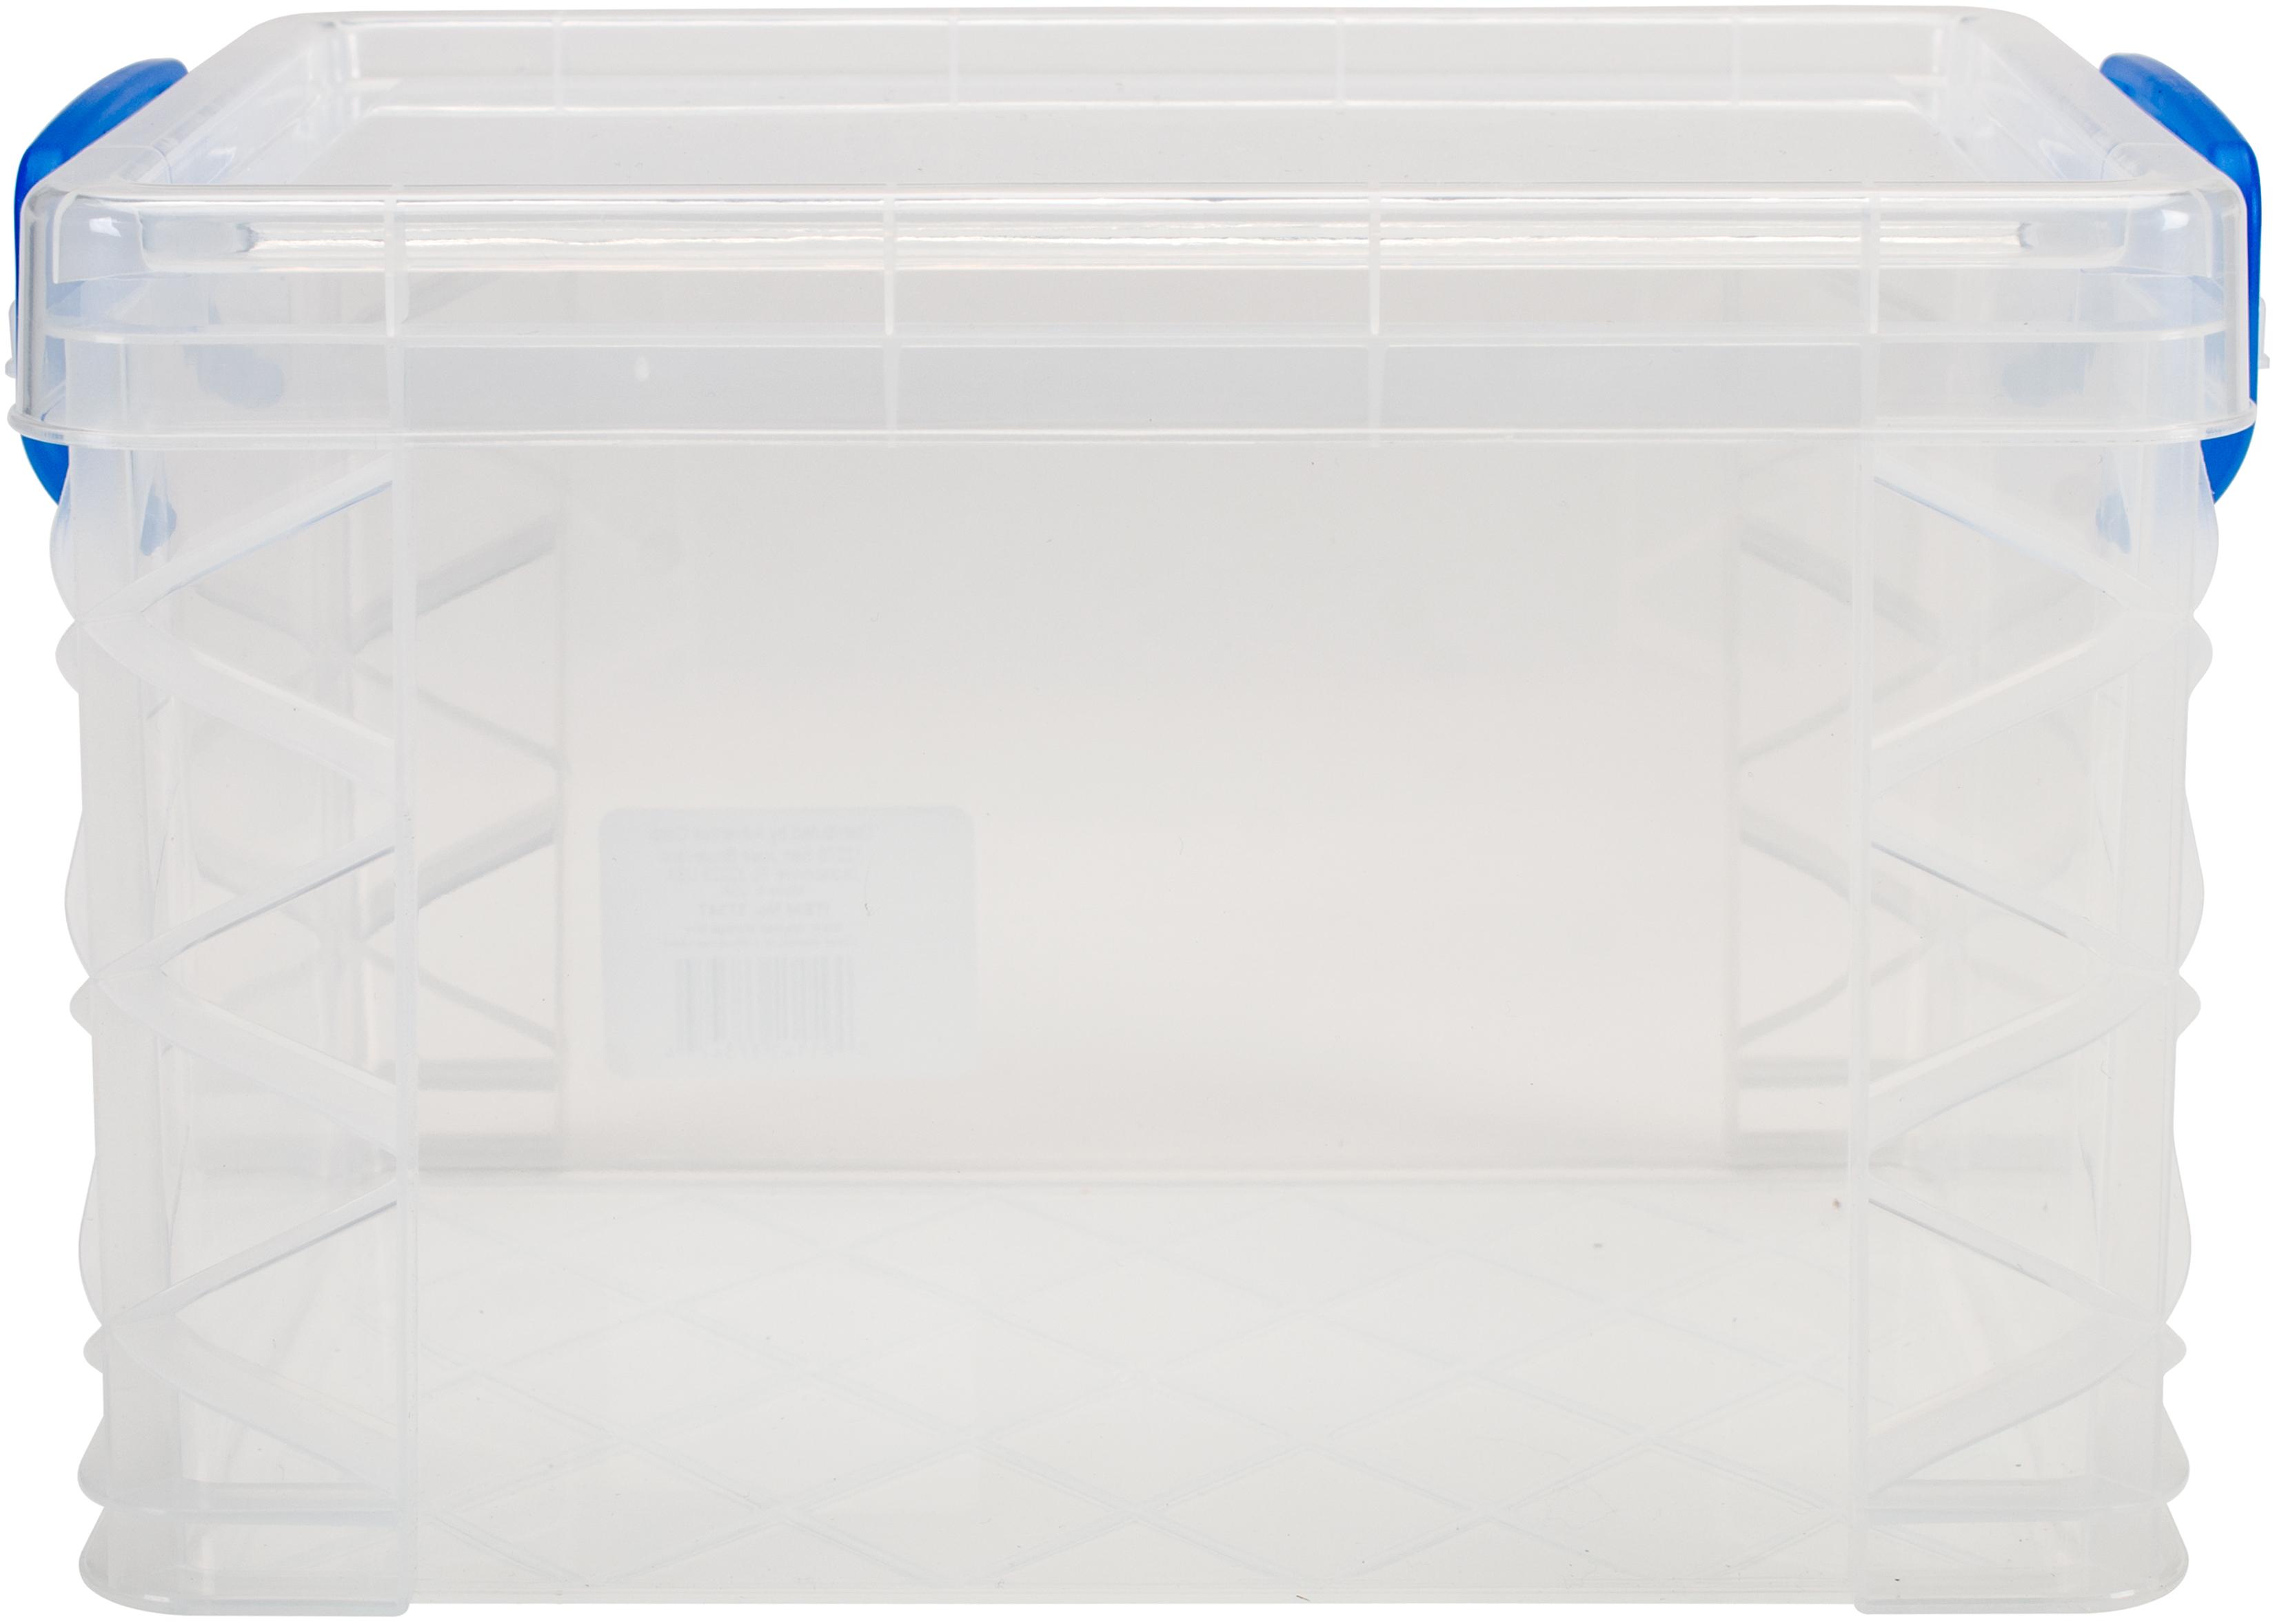 Storage Studios Super Stacker Storage Box-10.12X7.5X6.5 Clear/Blue Handles